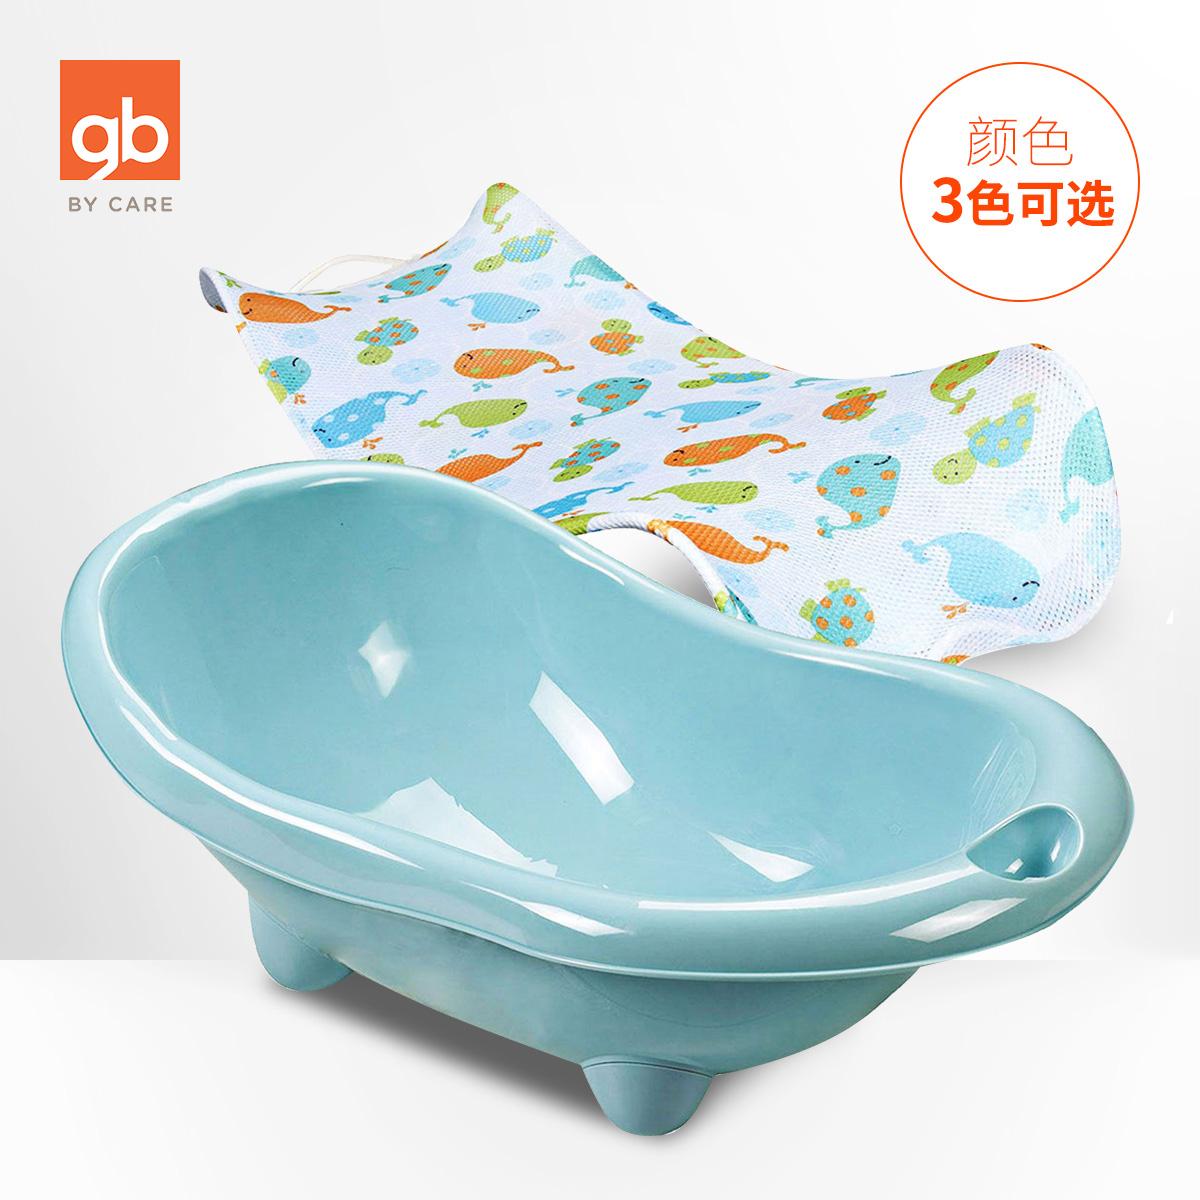 gb好孩子婴儿浴盆宝宝洗澡盆新生儿洗澡桶小孩子澡盆可坐躺送浴架